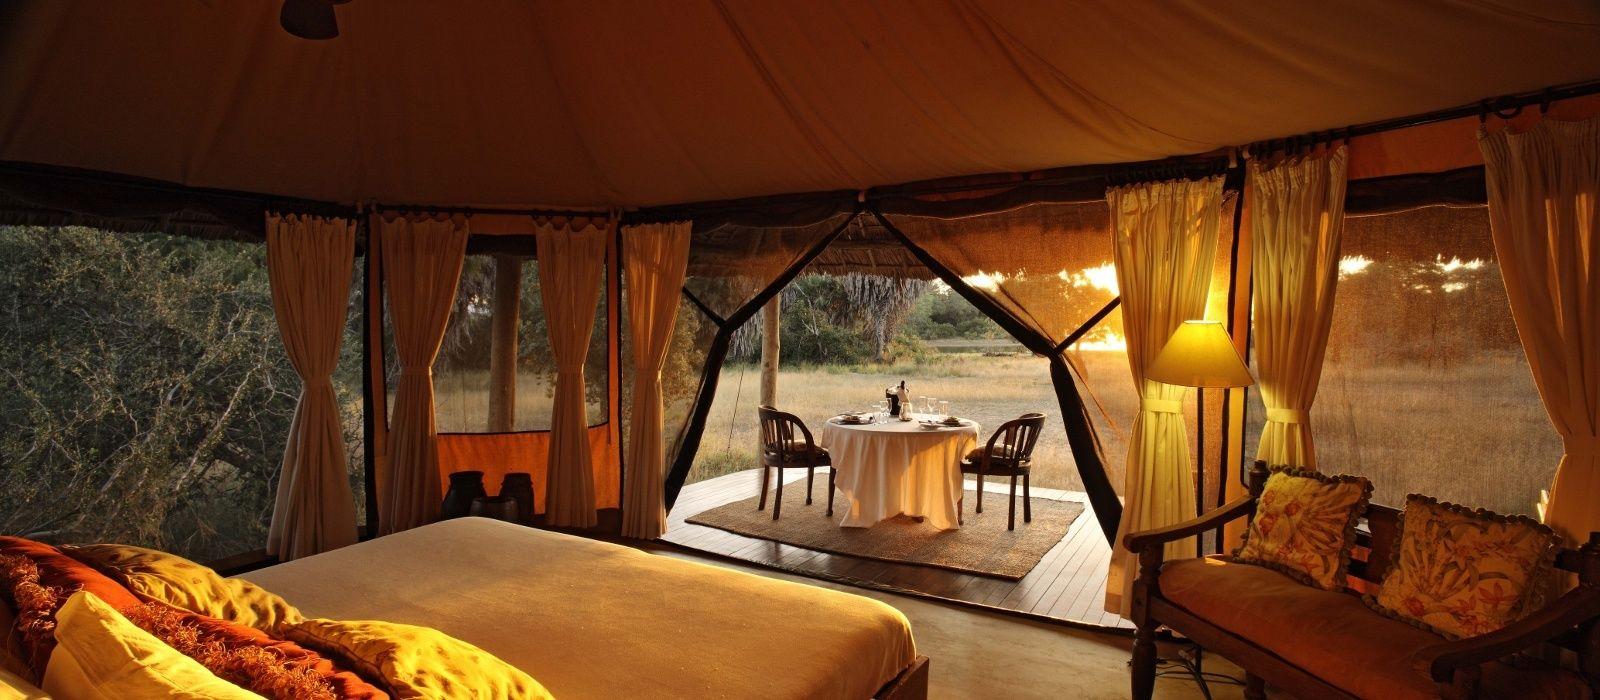 Tansania: Wahre Wildnis, unberührtes Juwel & Inselparadies Urlaub 5